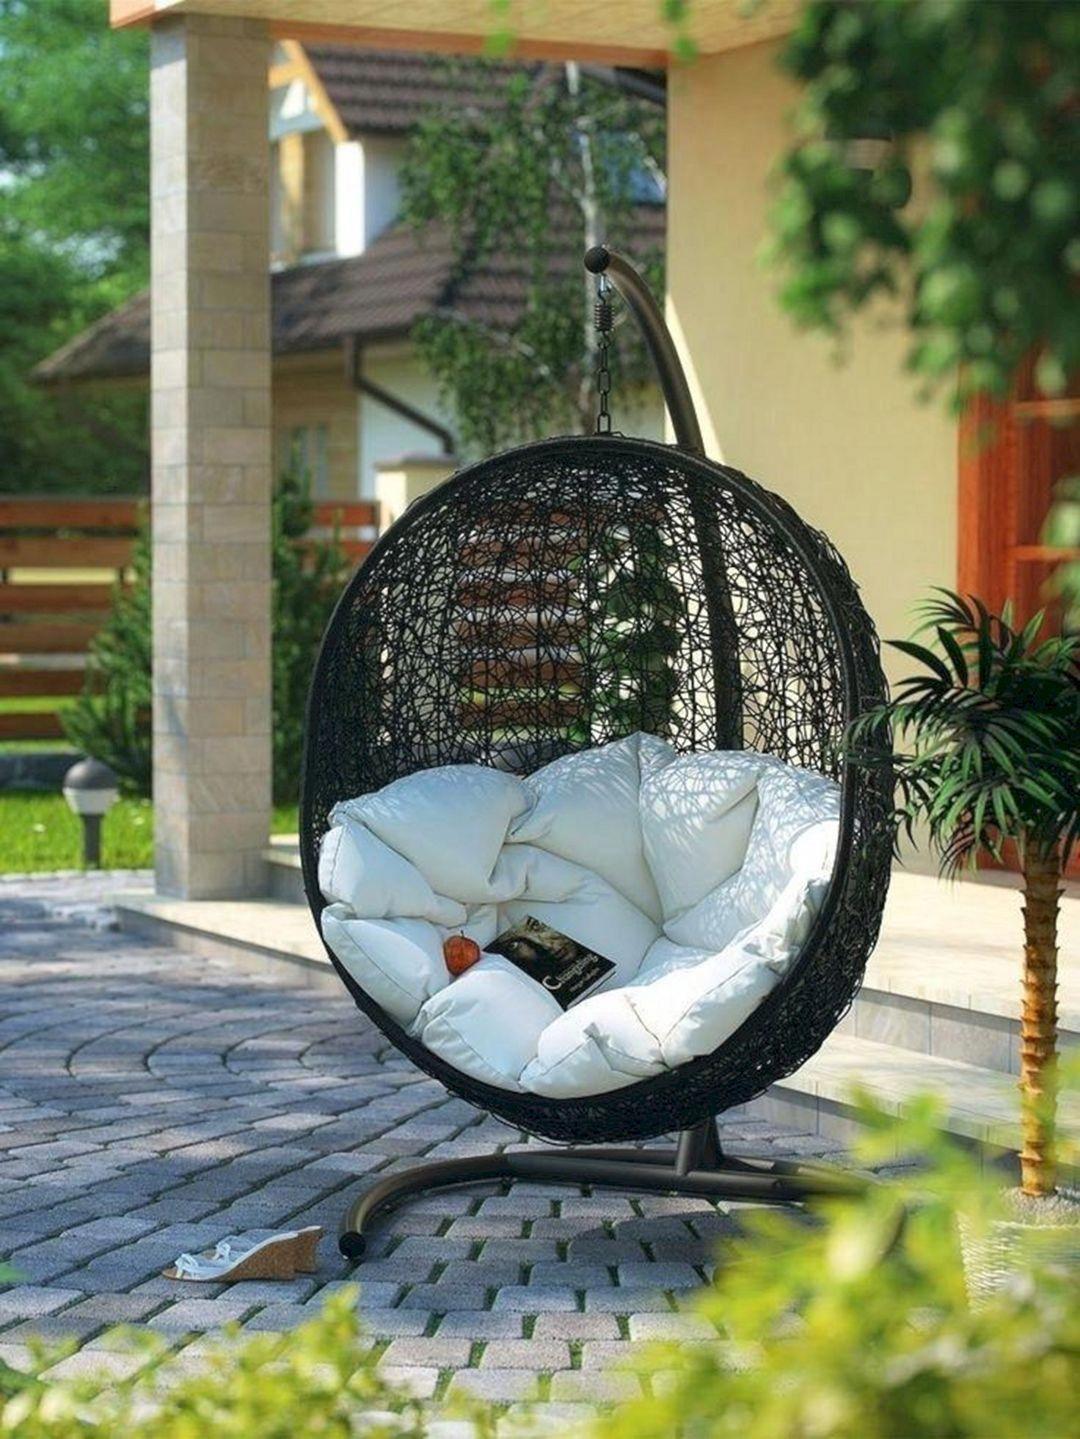 Outdoor Lounge Chair Cushions Patio Swing Chair Swing Chair